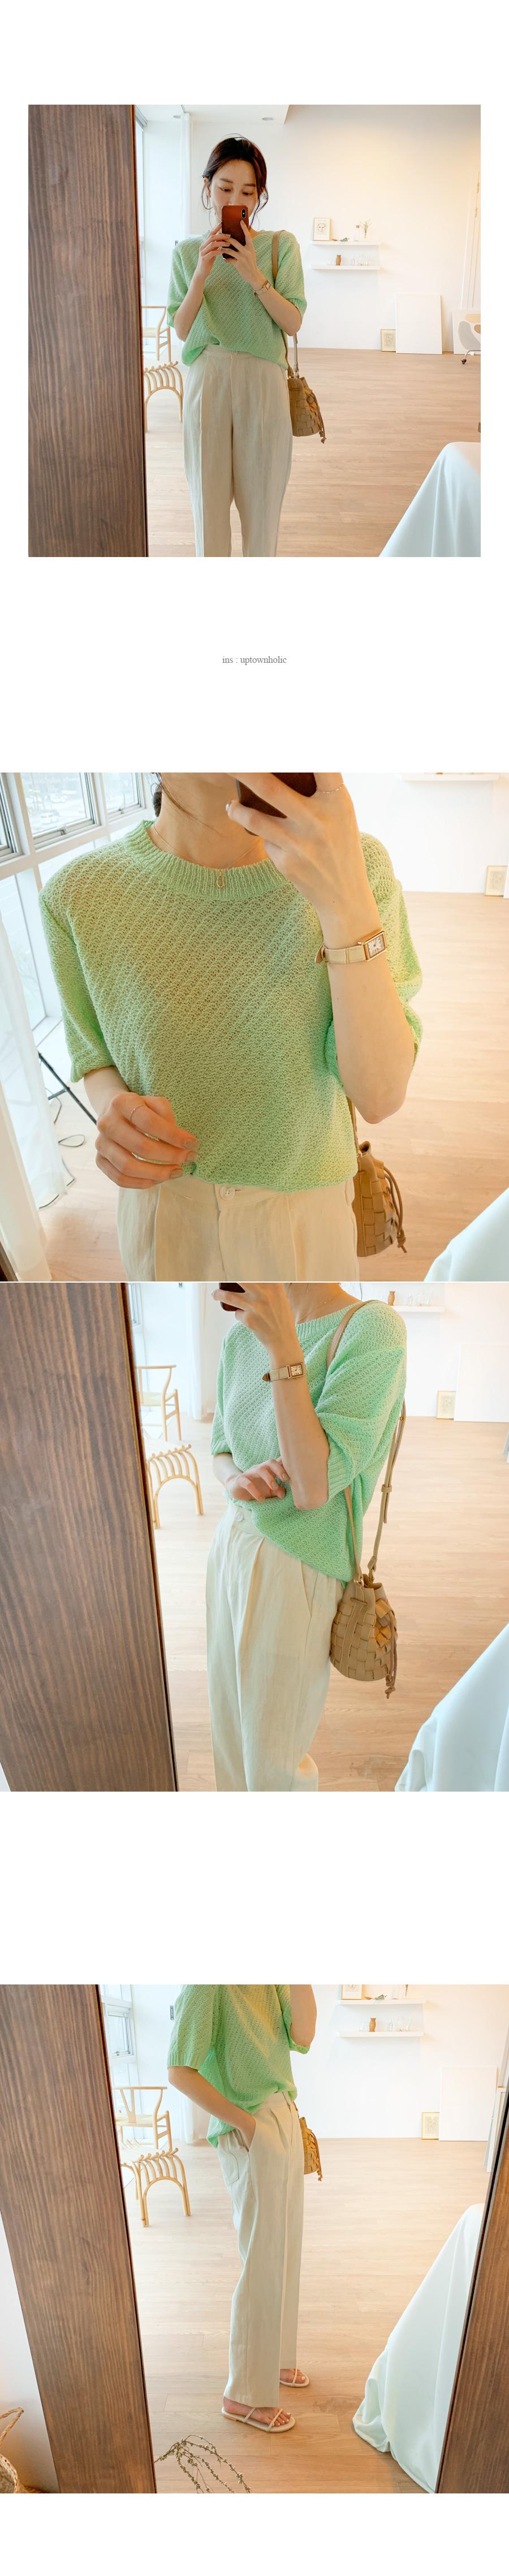 Pokin pastel knit